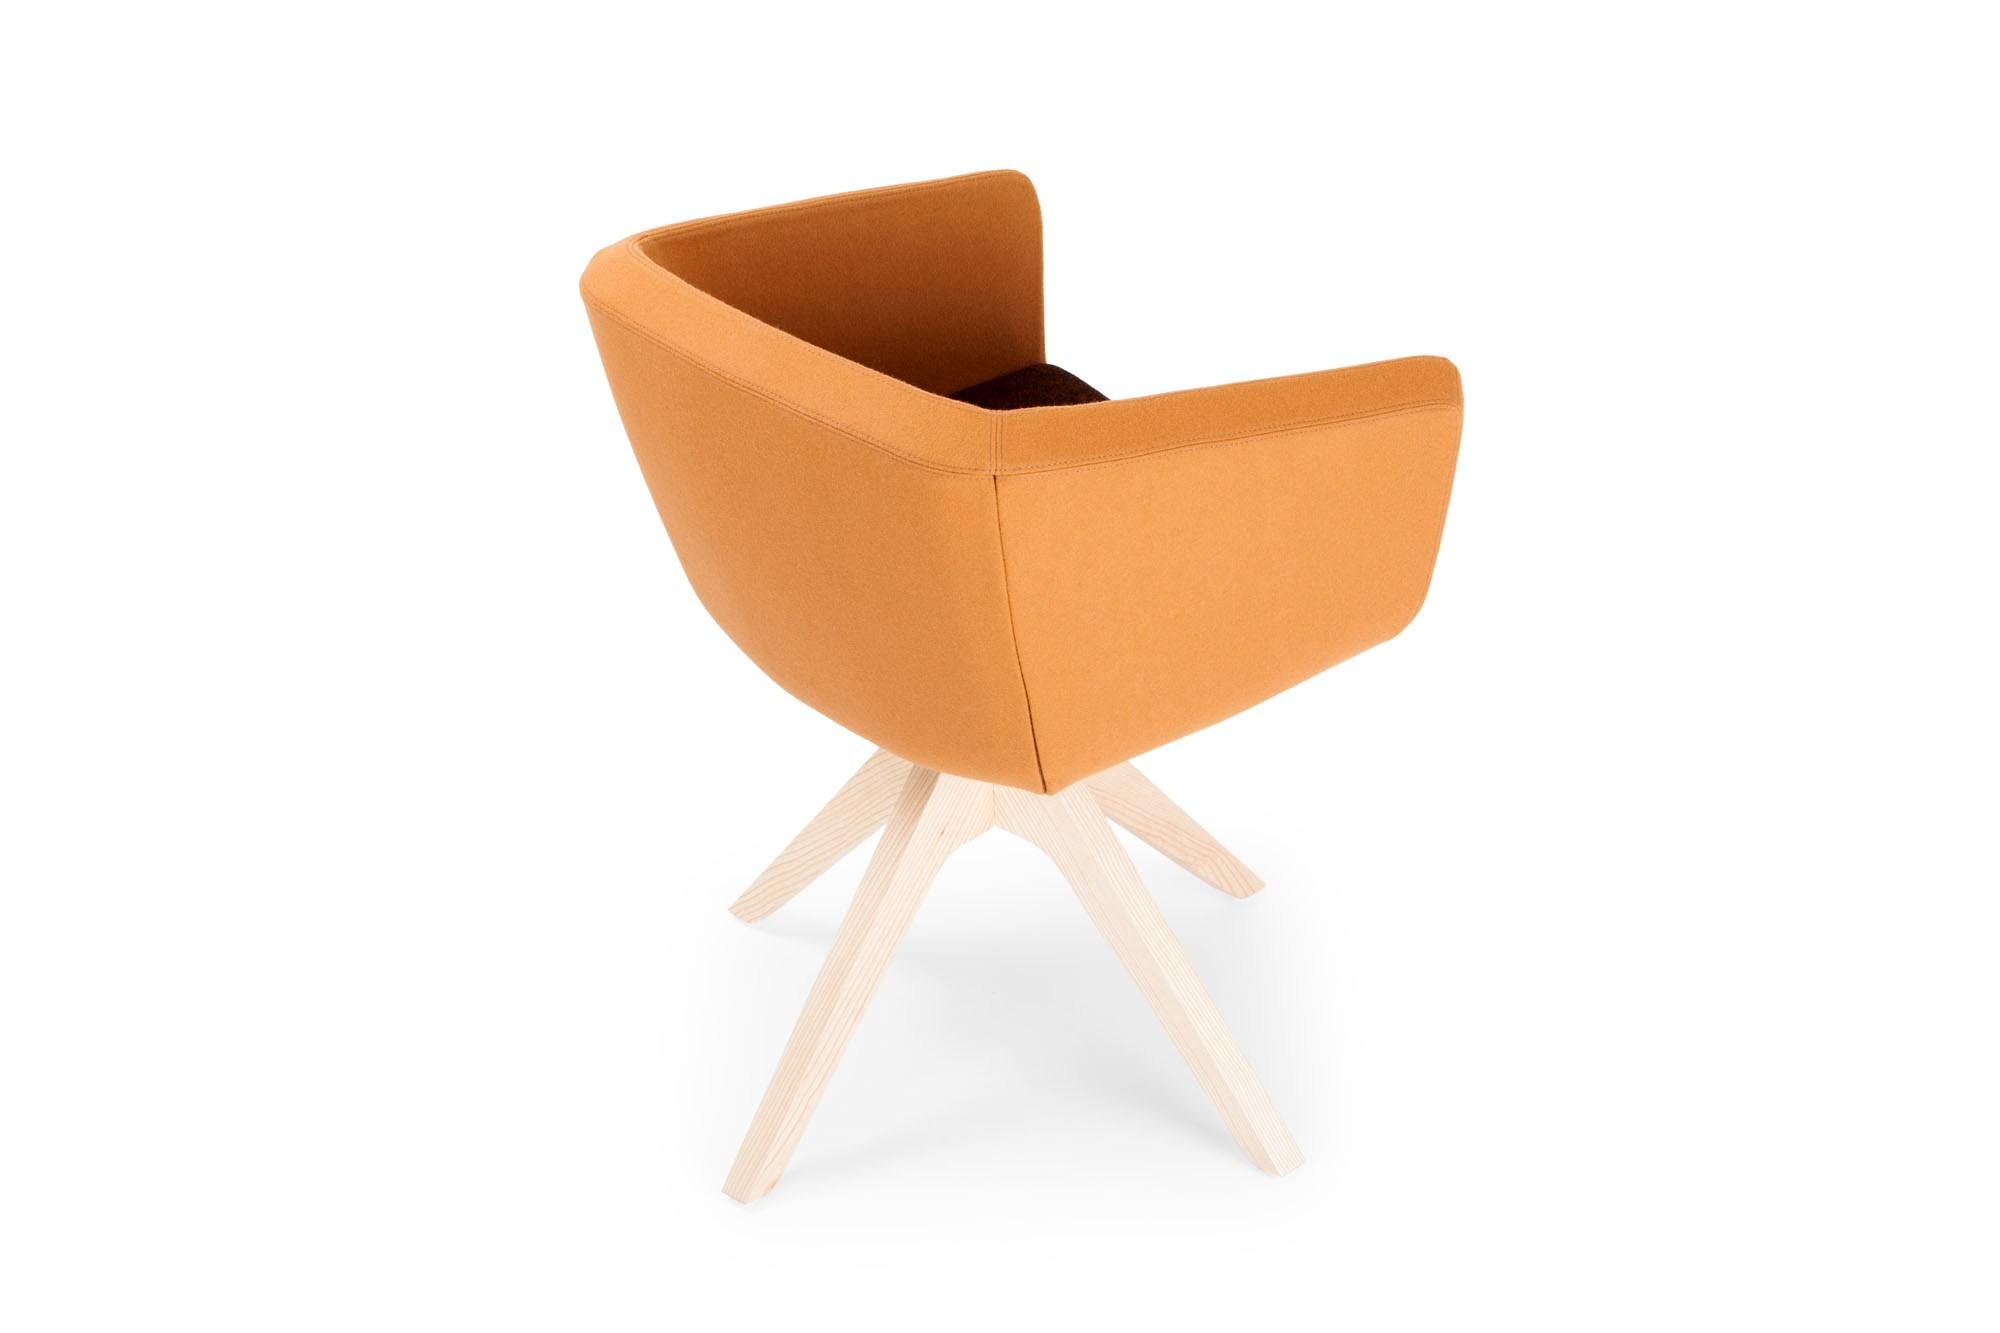 Arca Chair by Studio Orlandini for True Design